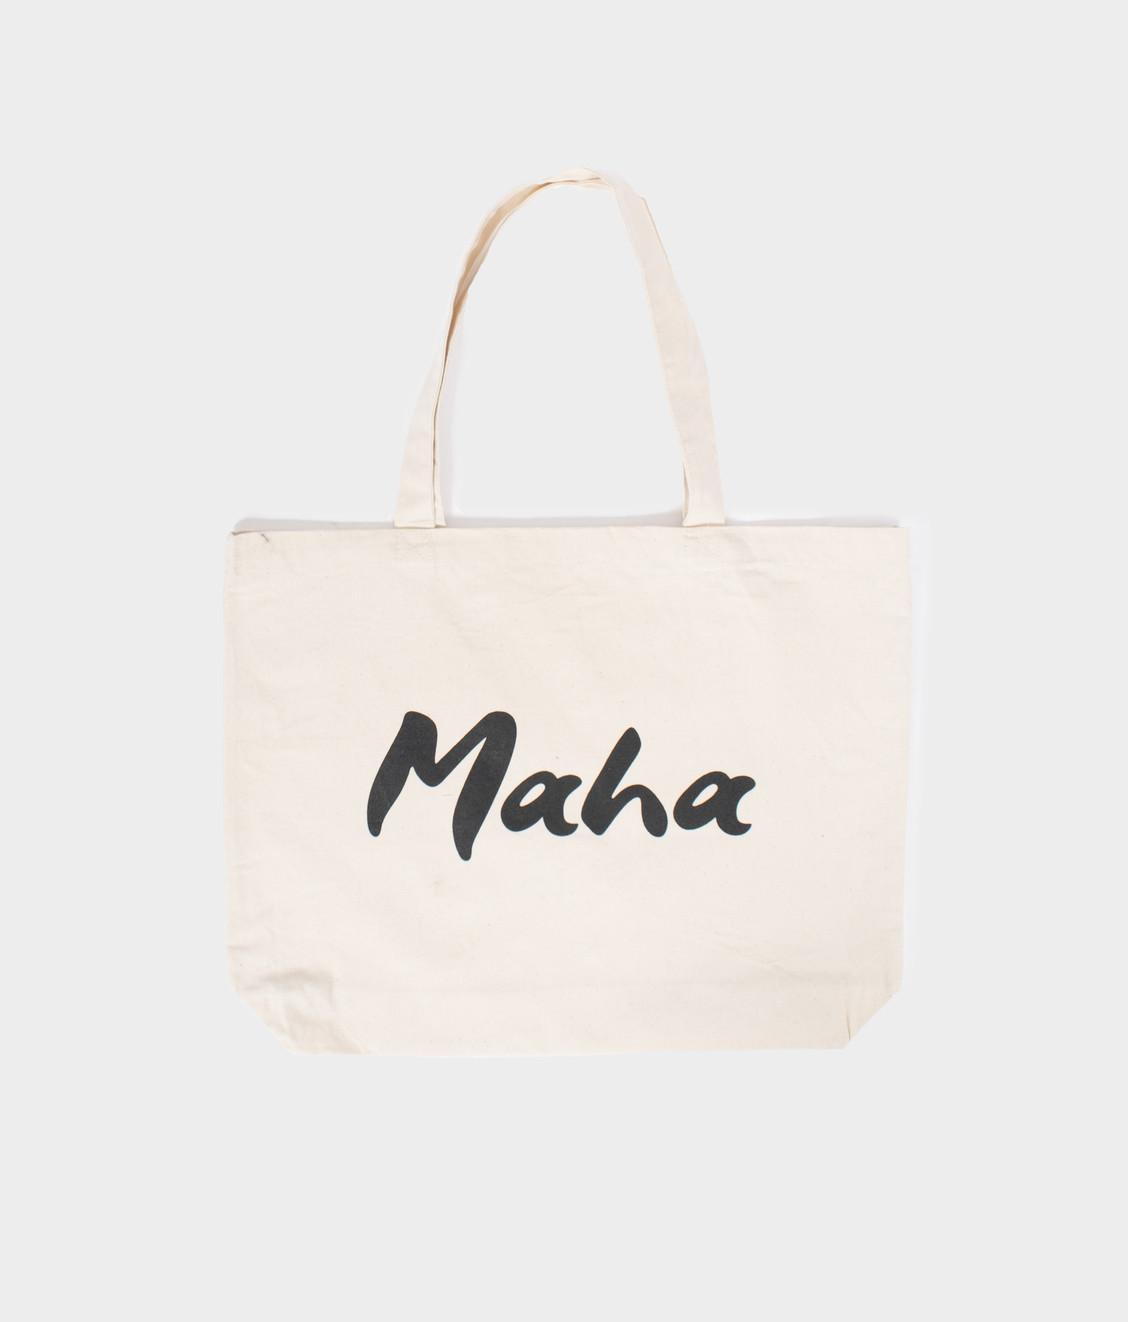 Maha Maha Tote Large Ecru